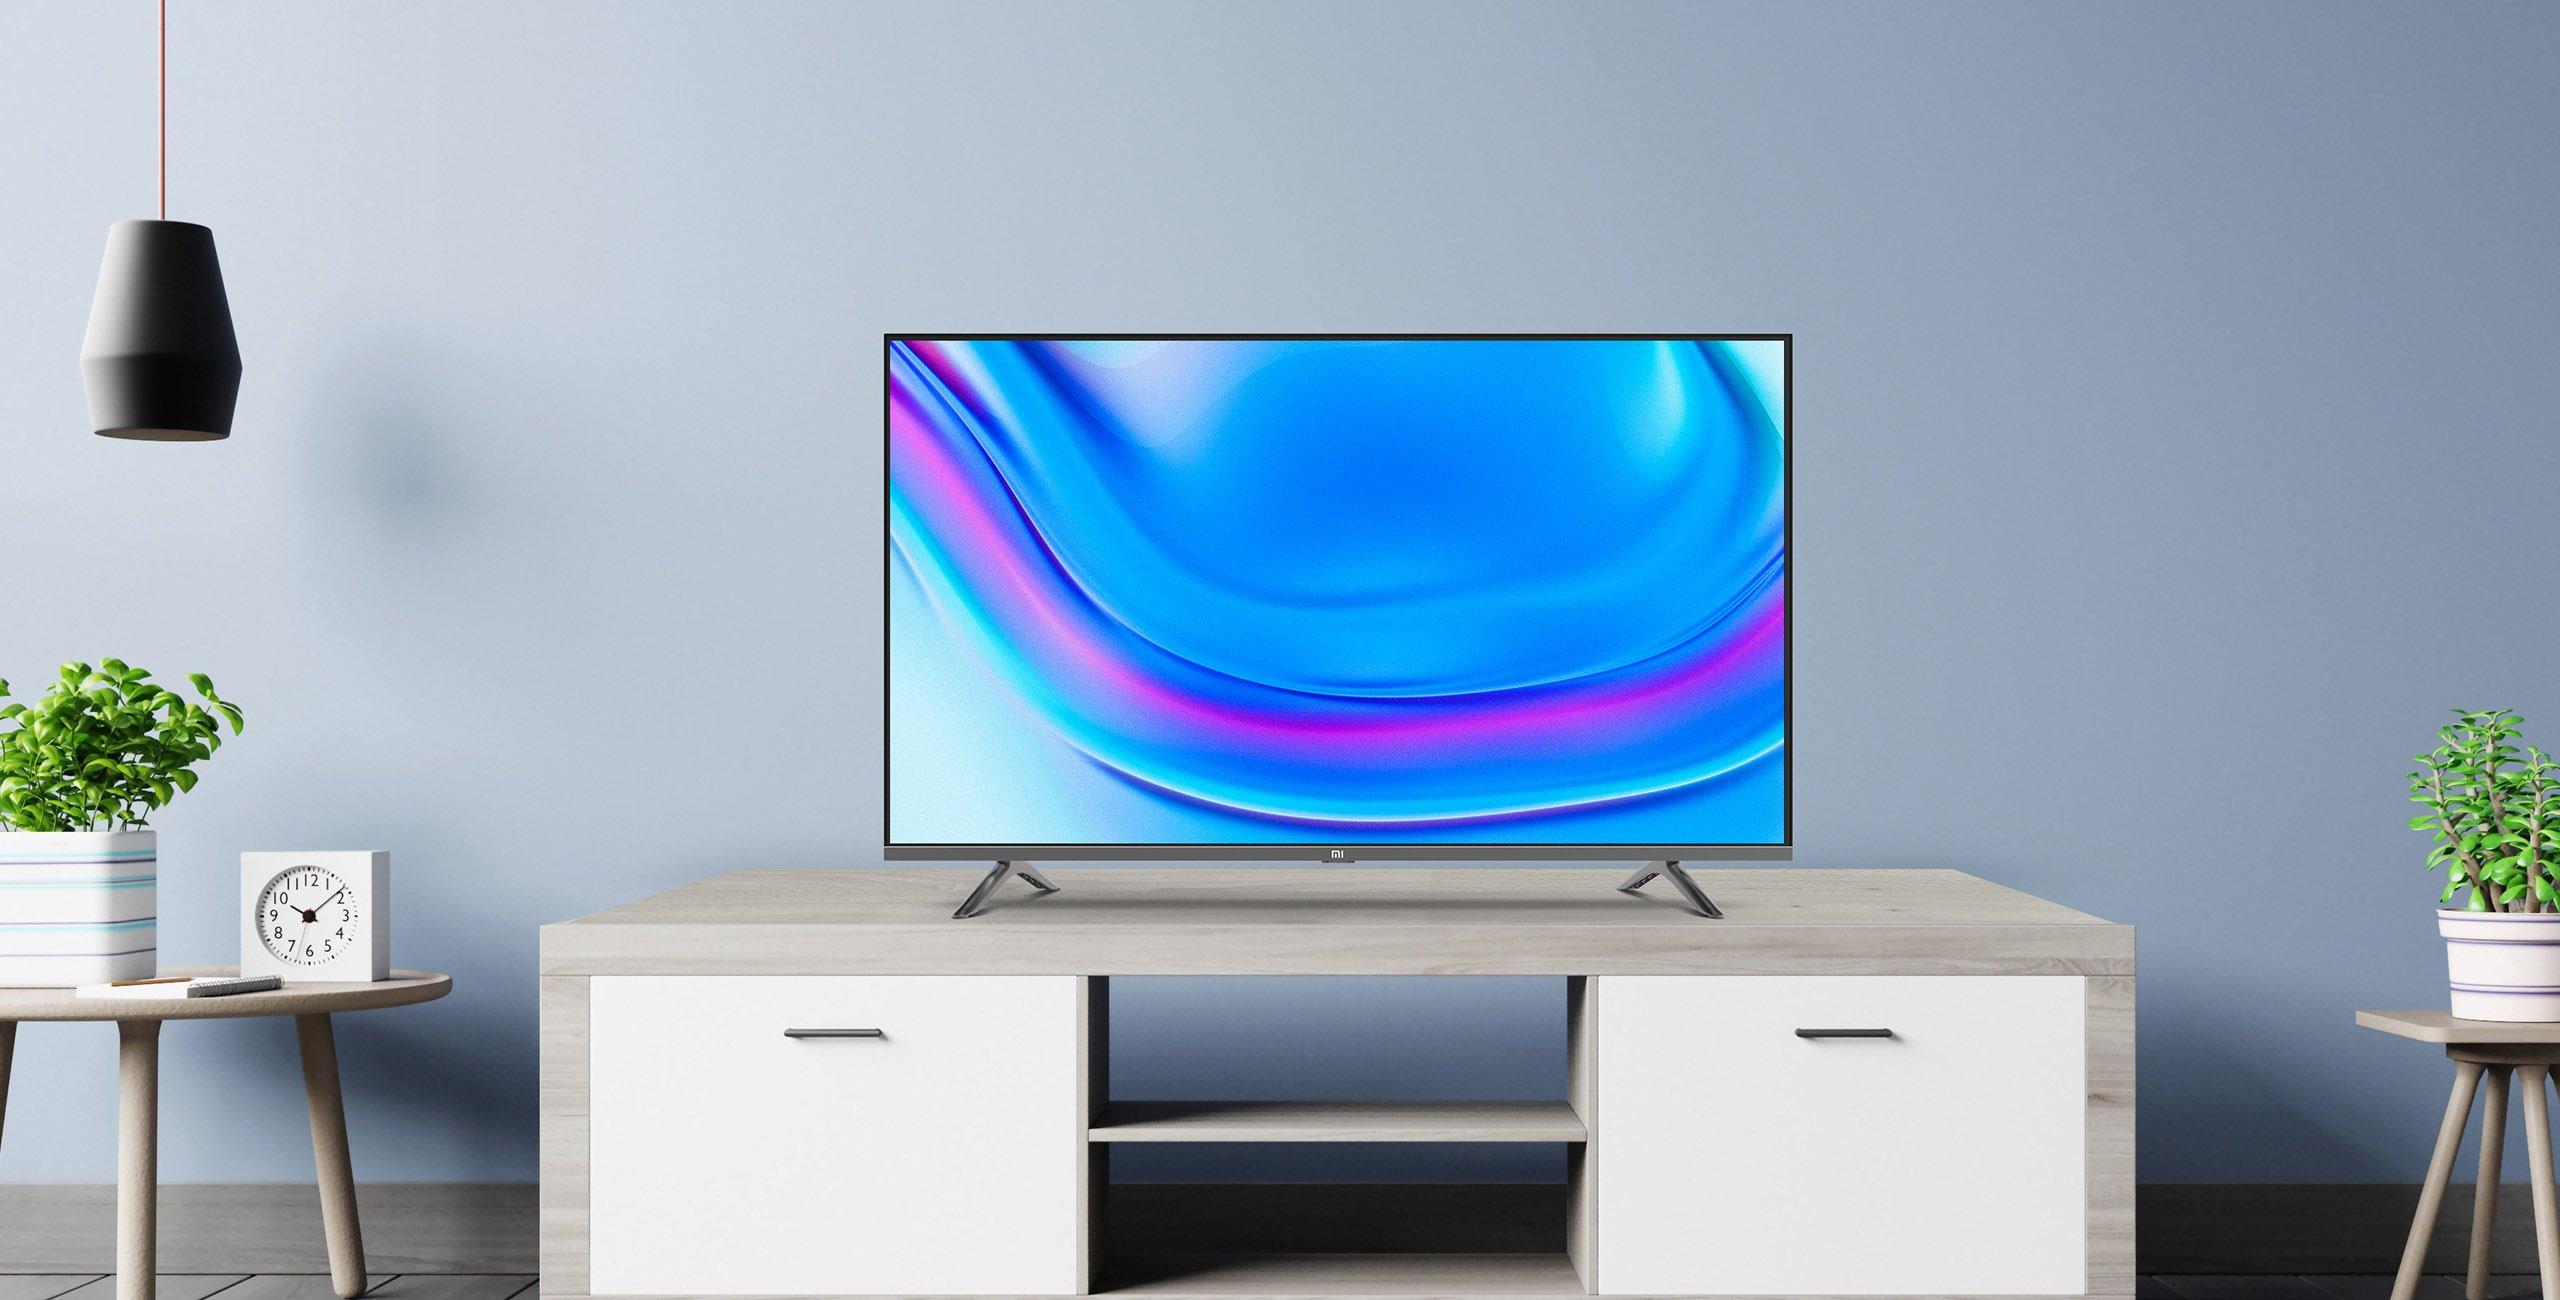 telewizor Xiaomi Mi TV 4A Horizon Edition 32 inch